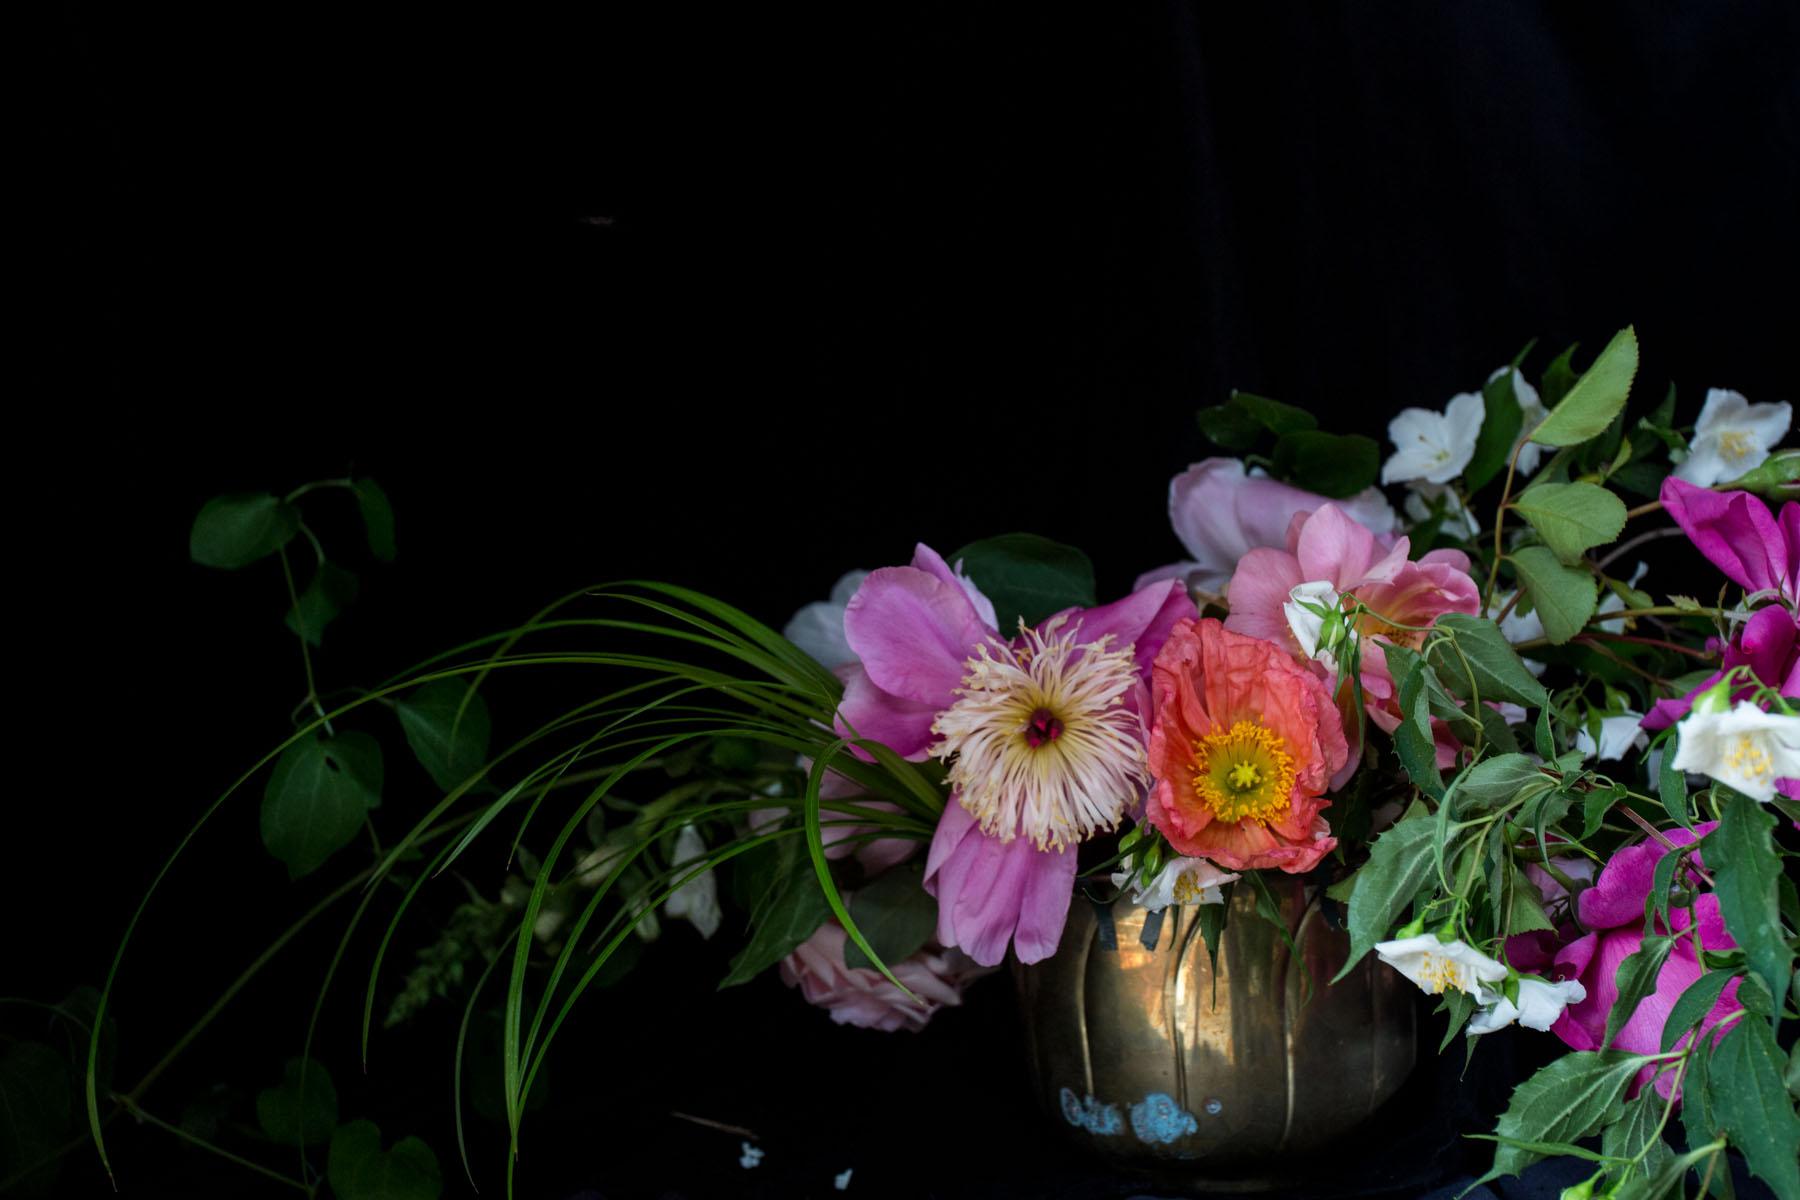 RA_spring beauty day_MANDY_-201604306897.jpg